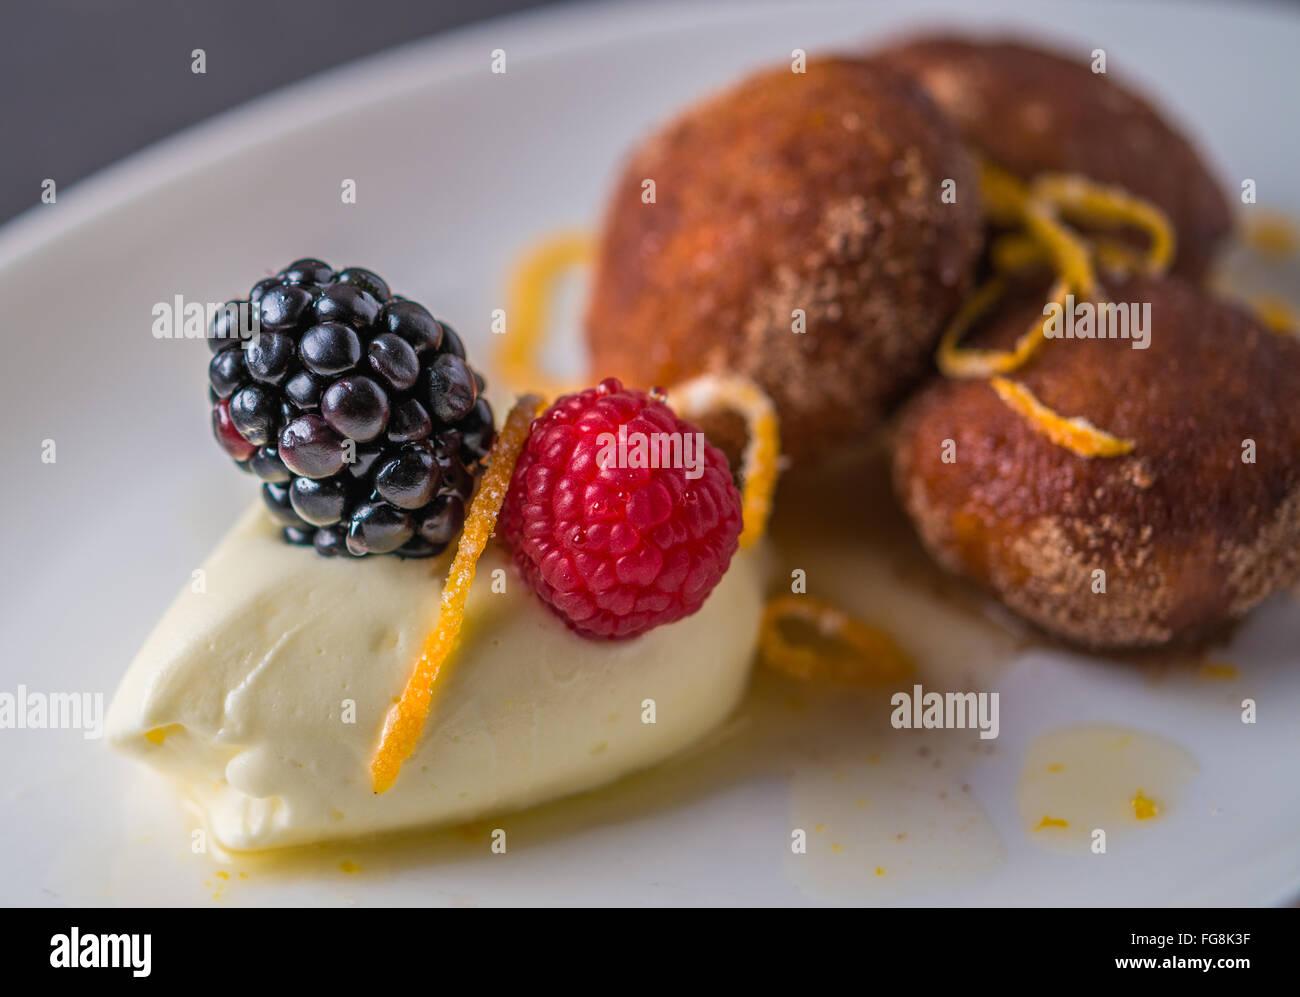 Sweets Pub Grub - Stock Image